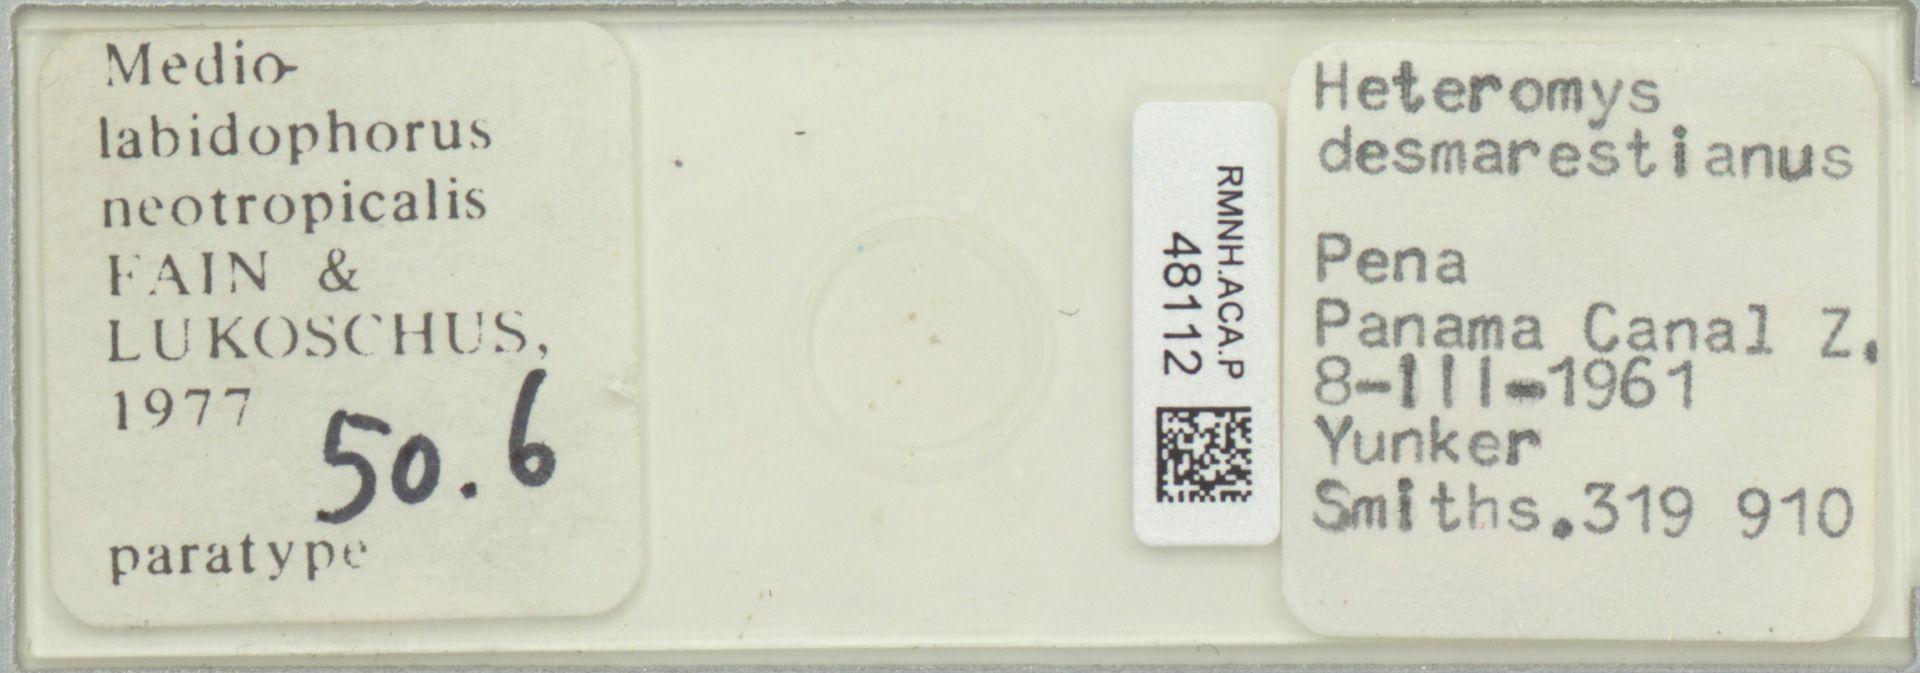 RMNH.ACA.P.48112 | Mediolabidophorus neotropicalis Fain & Lukoschus 1977